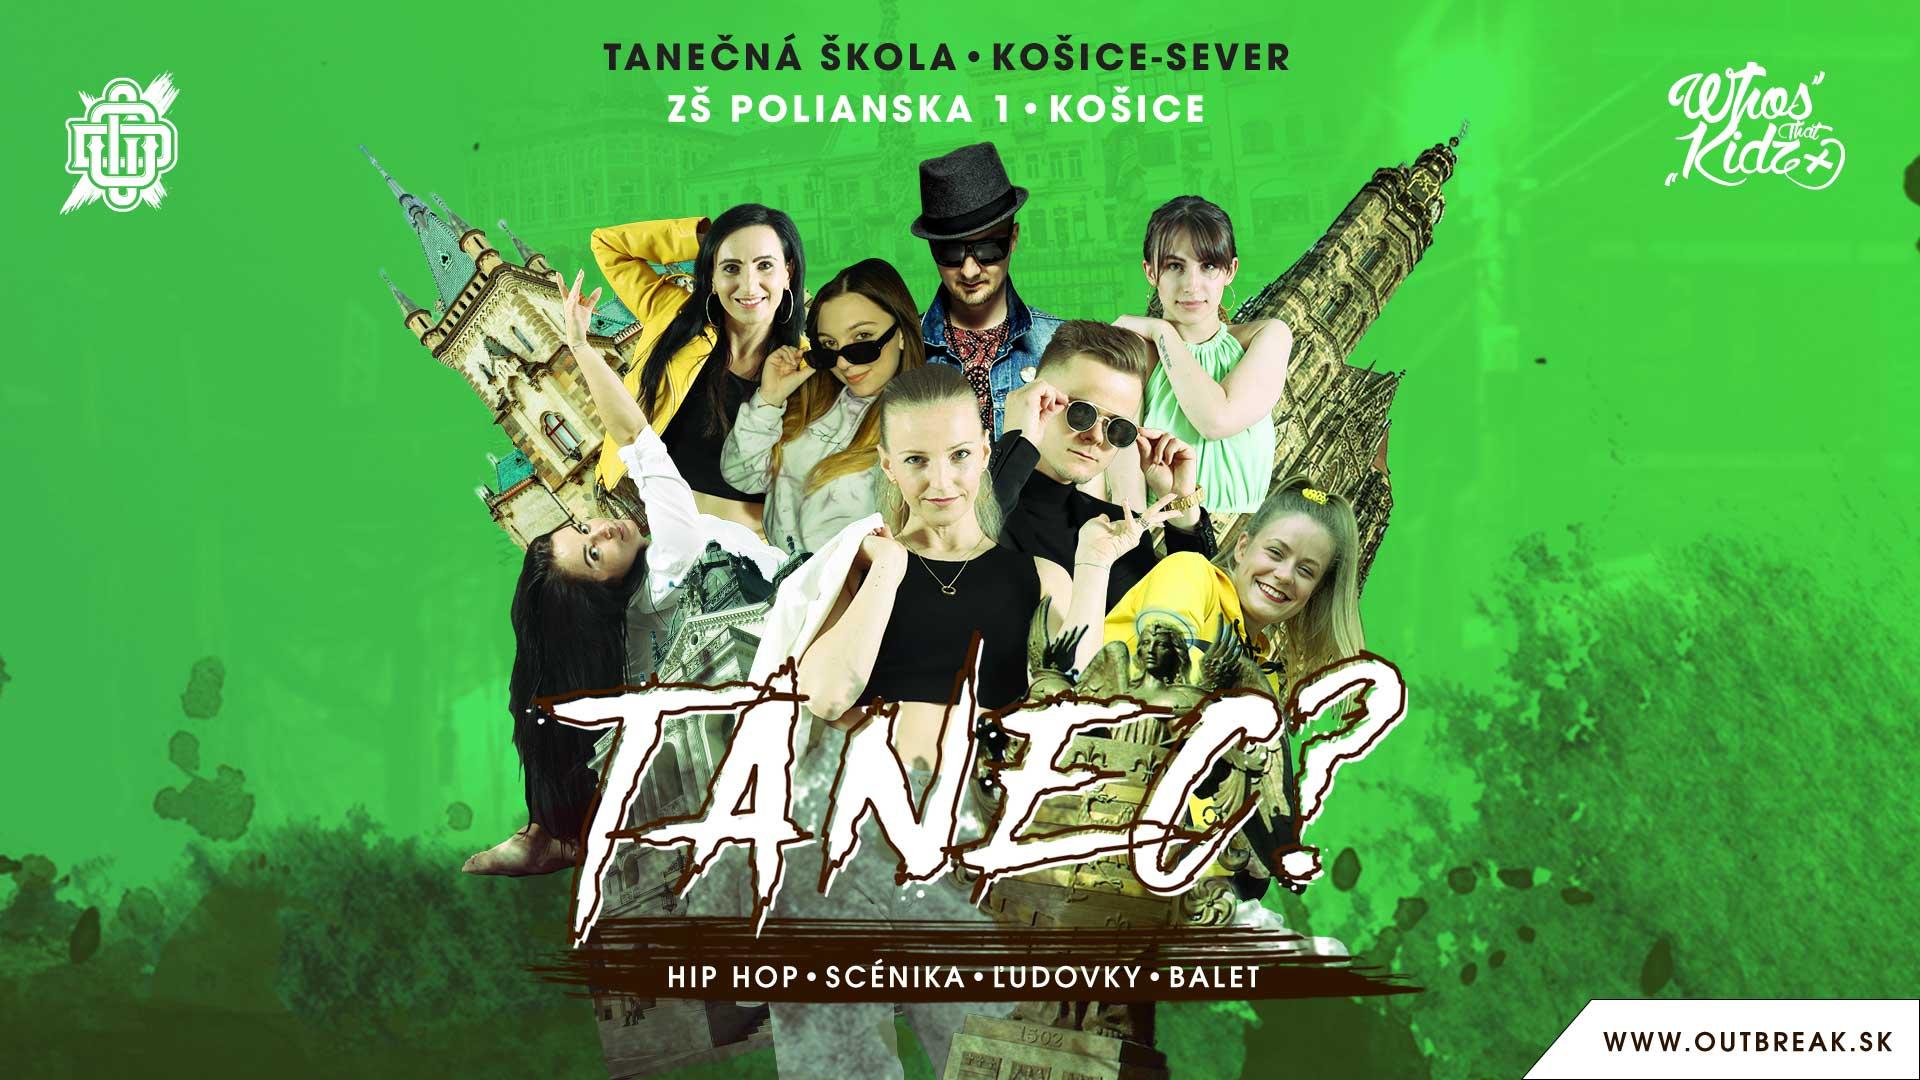 Tanečná škola Fénix, ZŠ Polianská 1, Košice-Sever ( Podhradová )